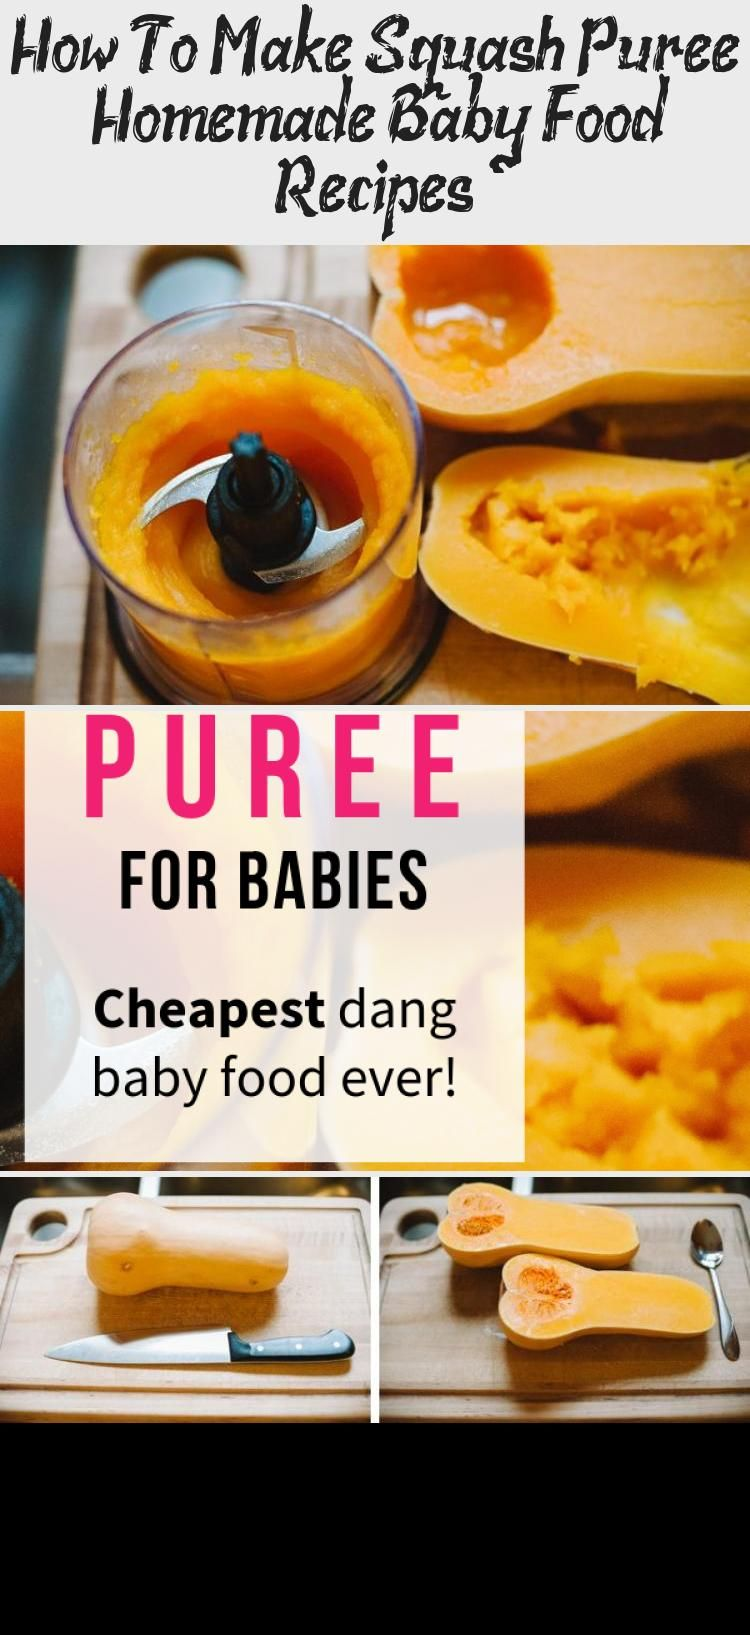 How to make squash puree homemade baby food recipes